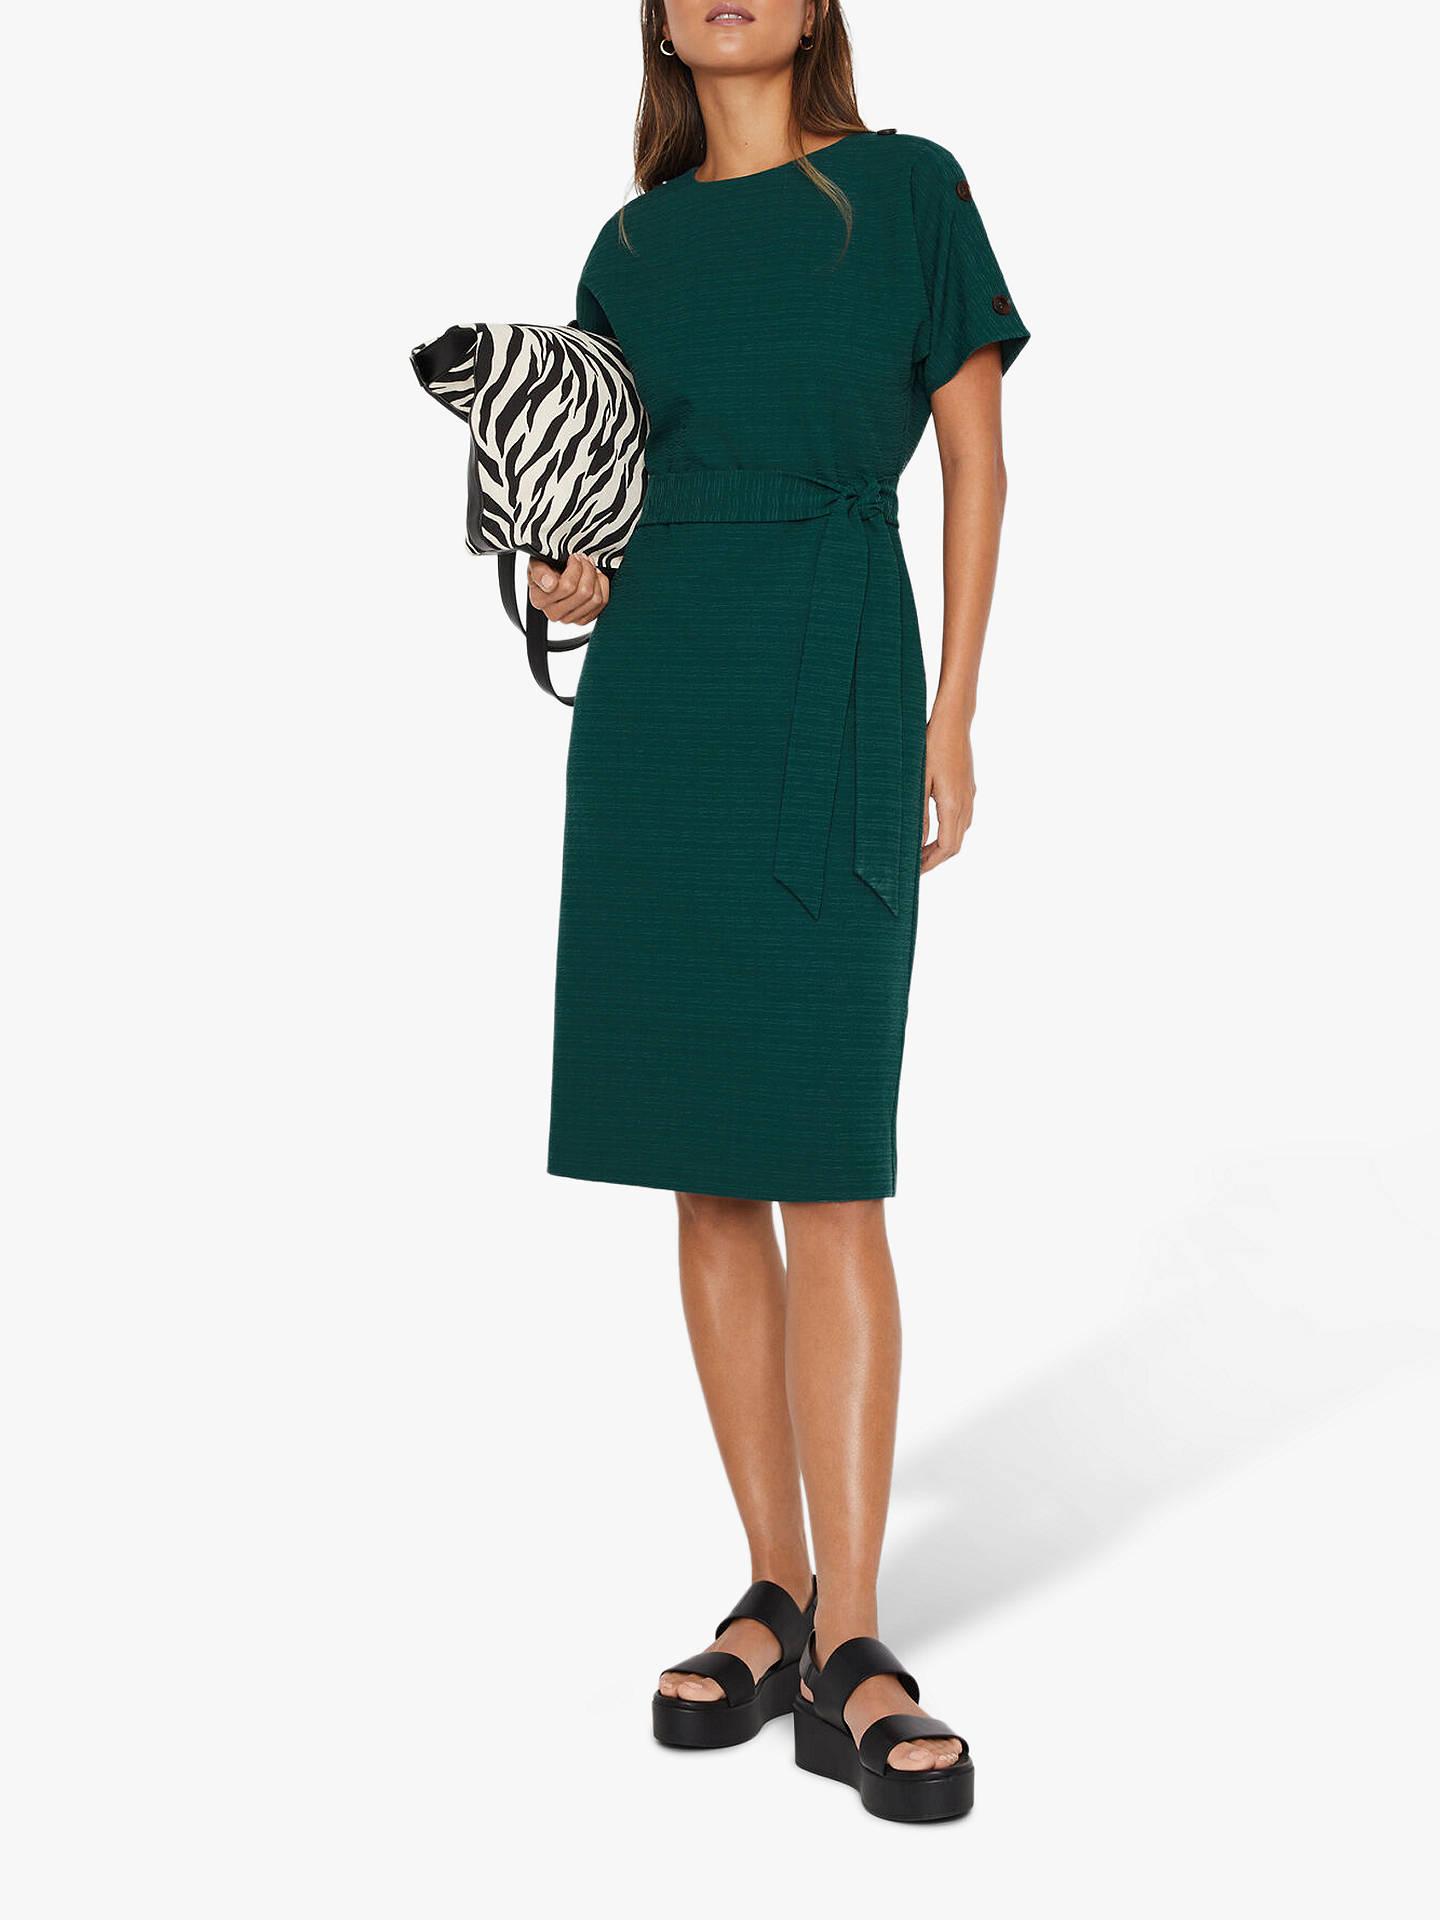 Warehouse Tie Waist Crinkle Dress, Dark Green by Warehouse